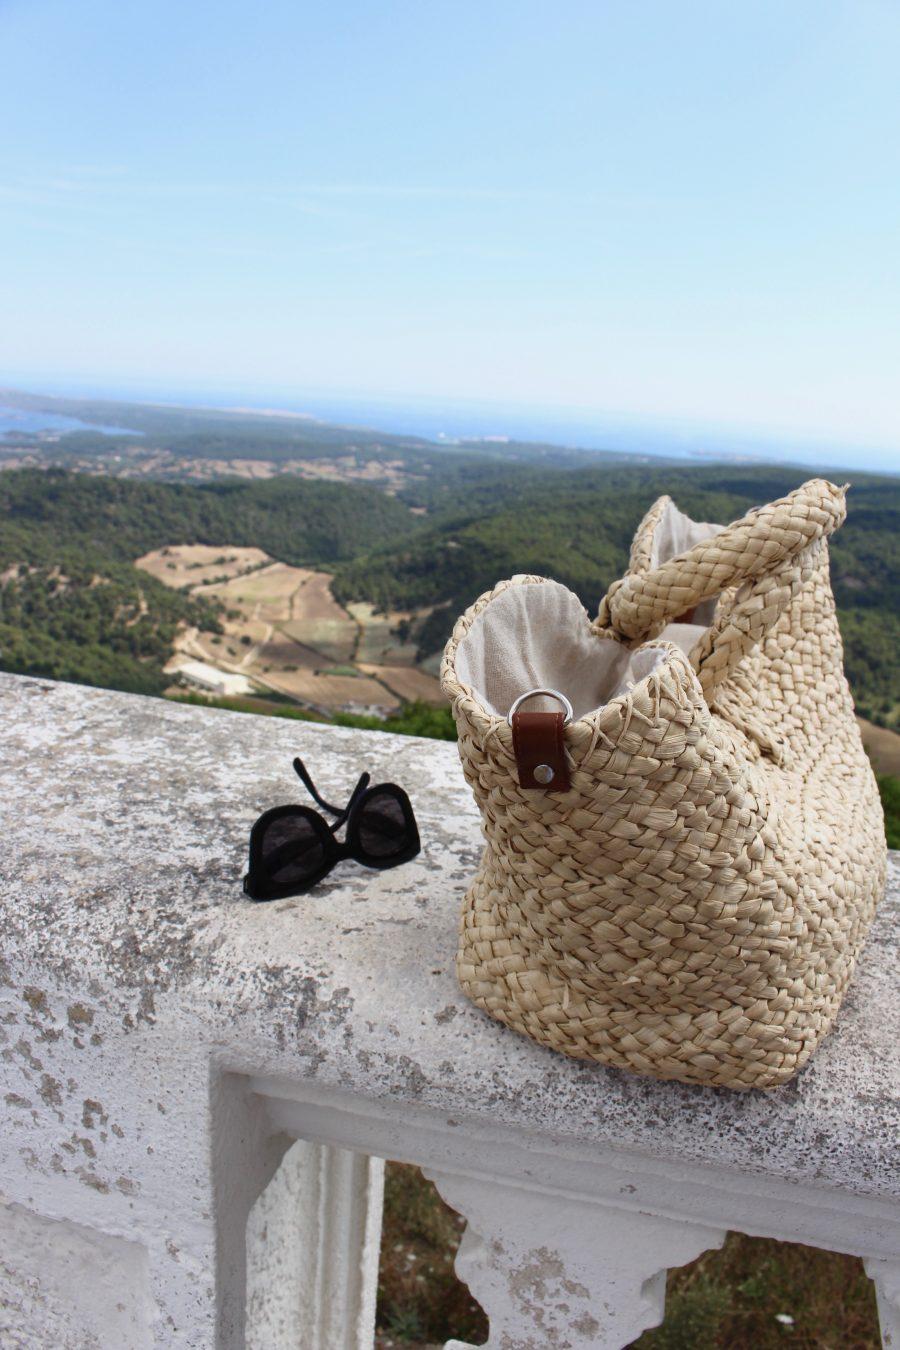 H&M Summer bag